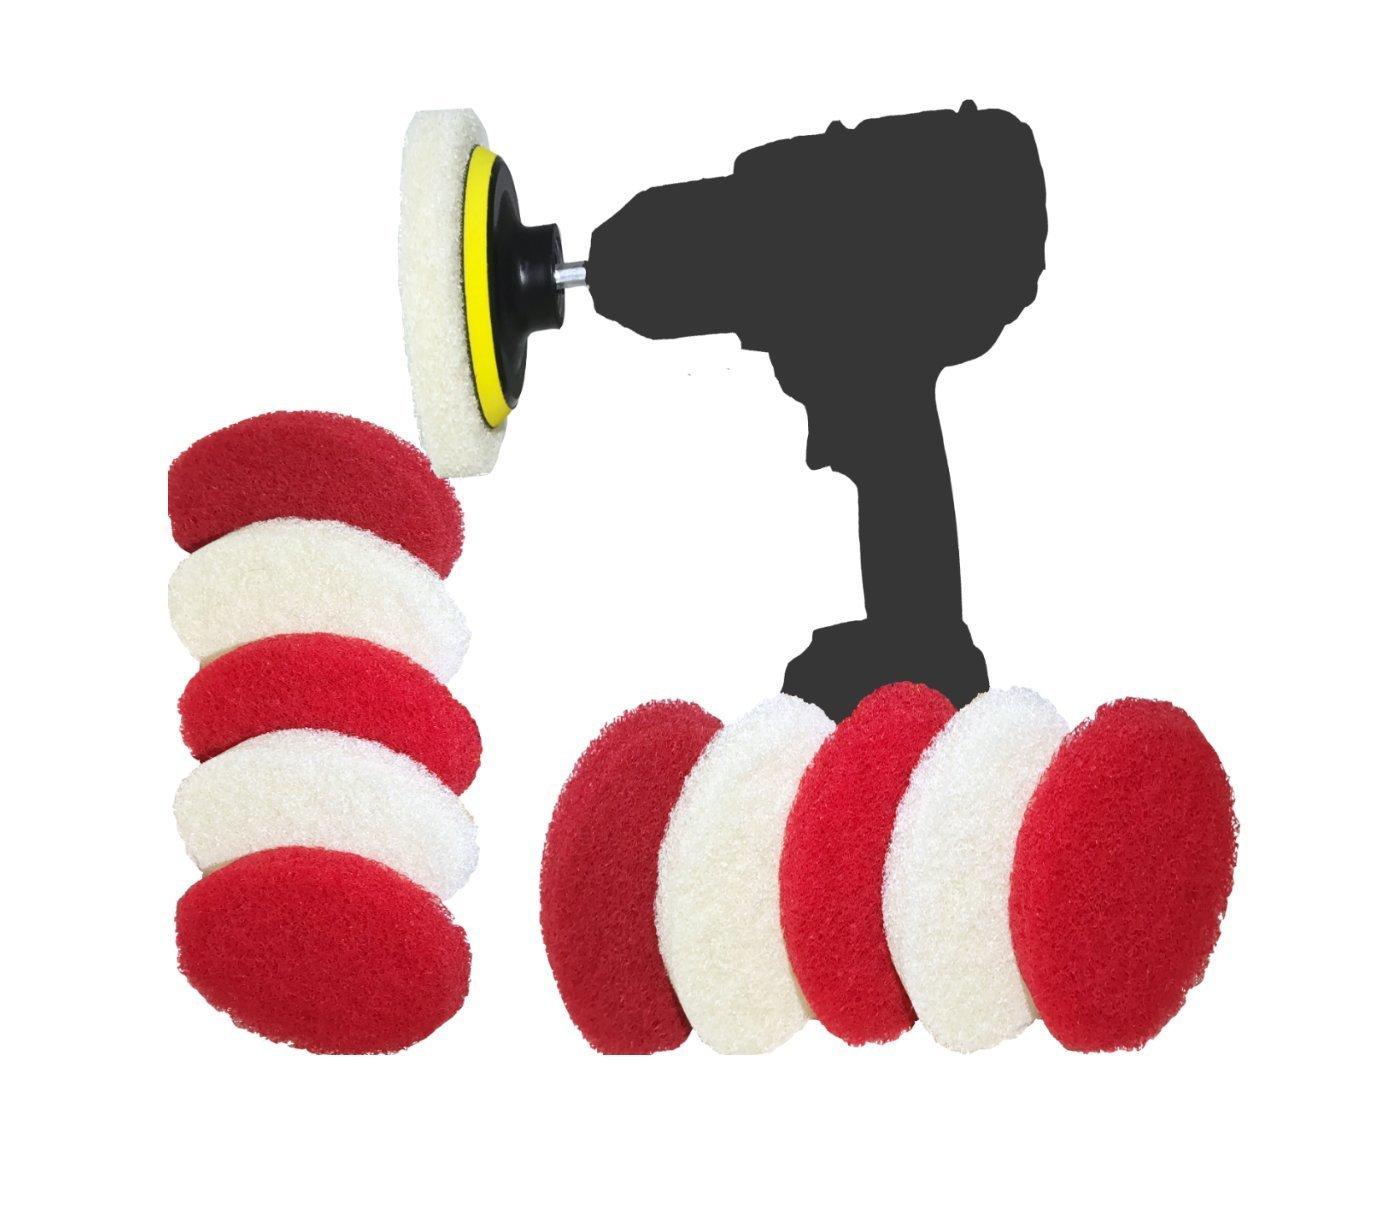 Spin-Scrub Drill Brush Scrub Pad with Drill Attachment - Spin Scrubber for Tile, Sink, Water Spot, Fiberglass Tub, Vinyl Floor - Non-Scratch - Bathroom Scrubber Attachment For Drill (12-Pack)